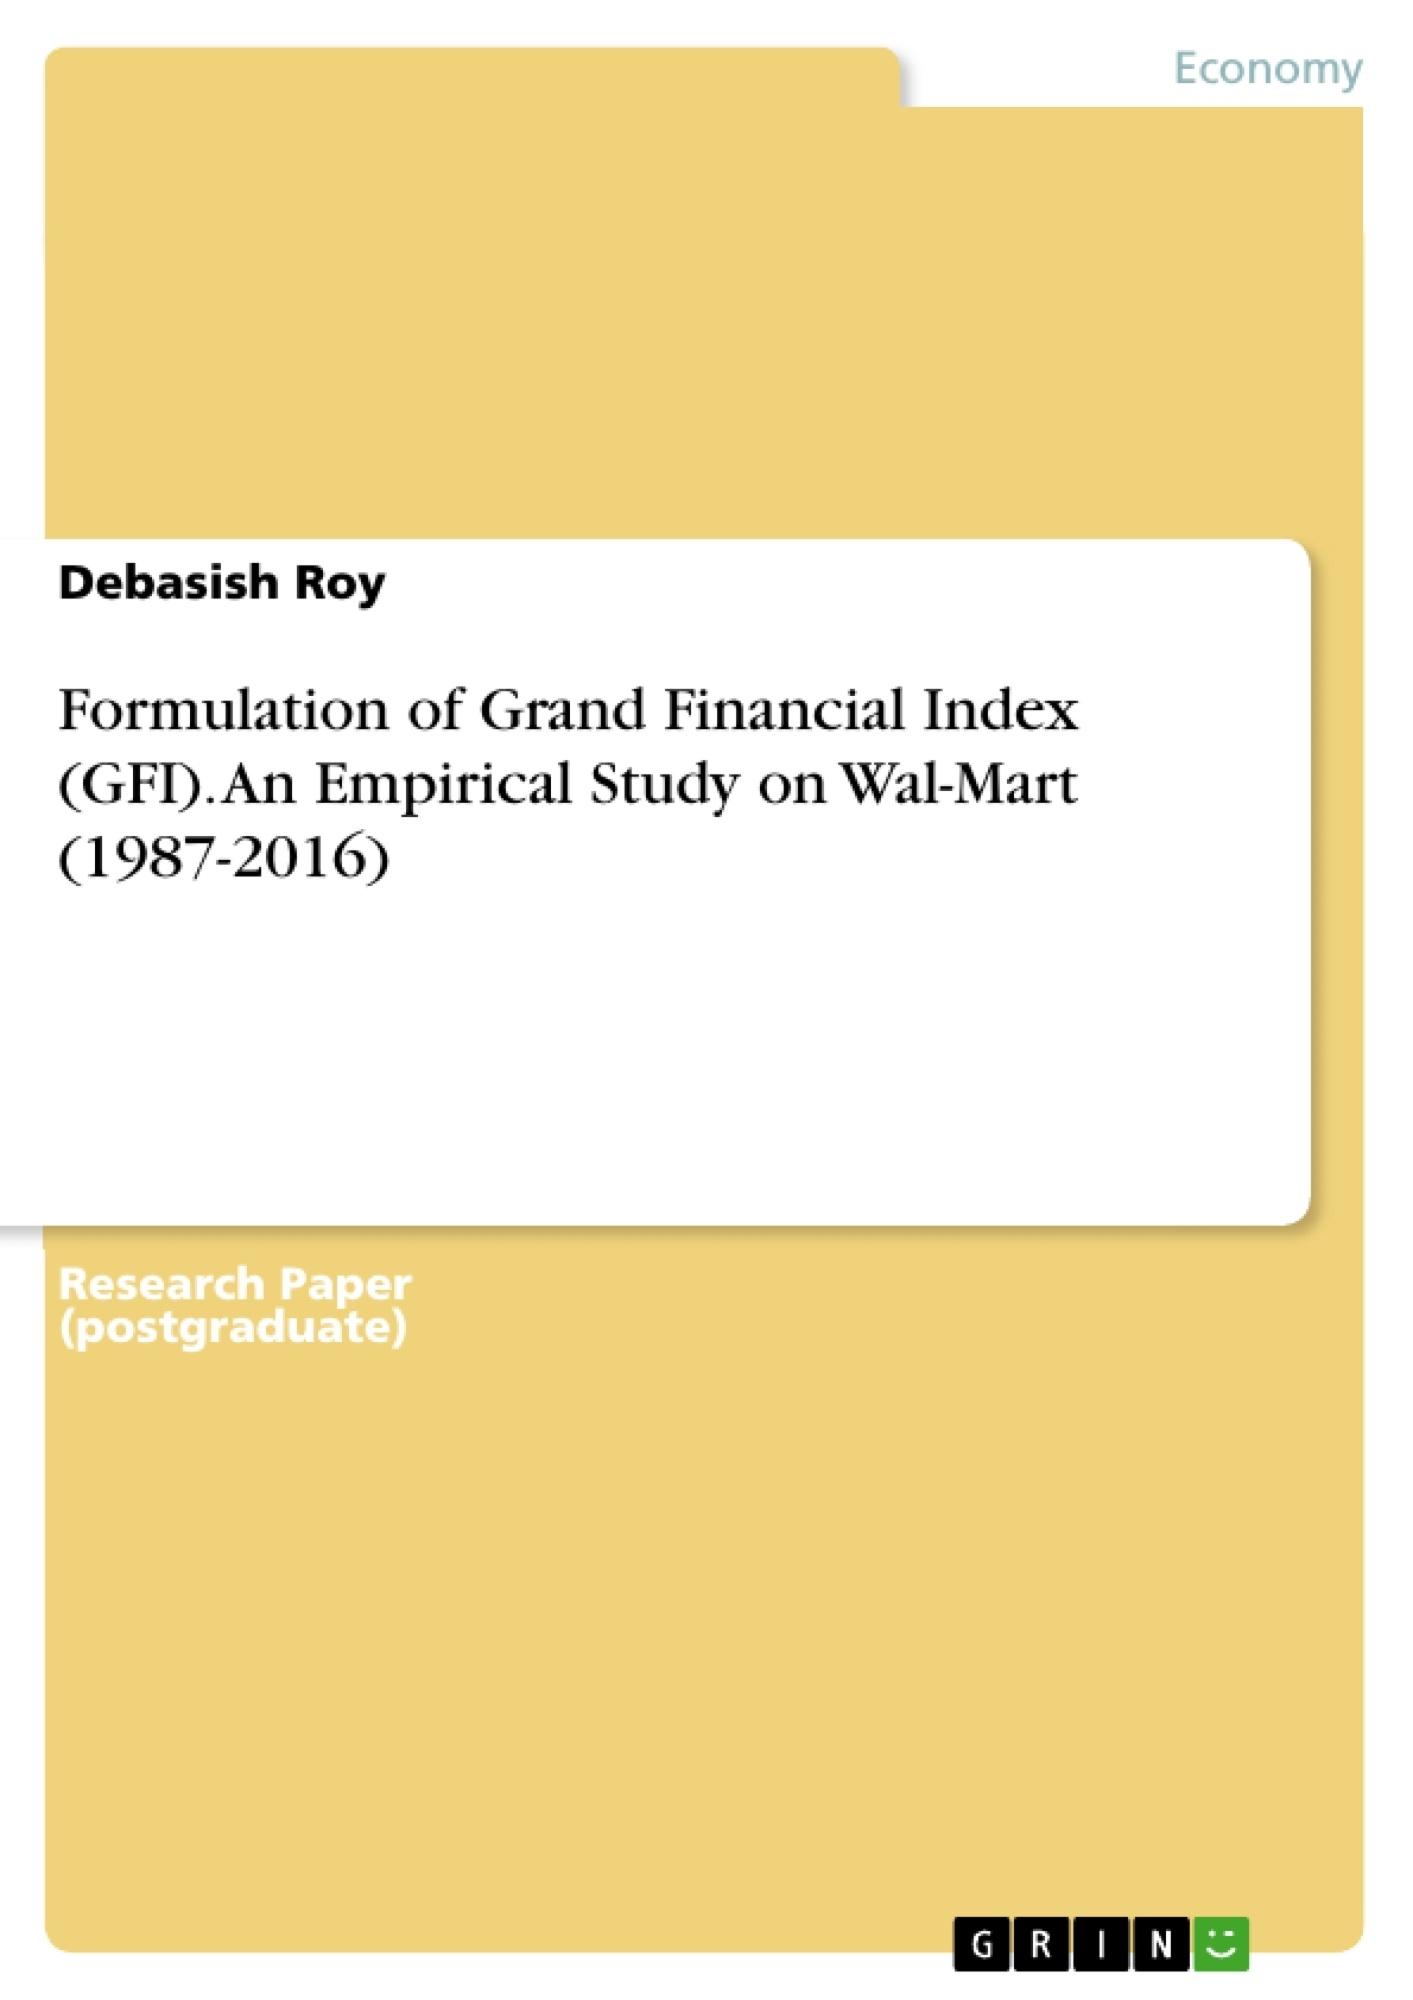 Title: Formulation of Grand Financial Index (GFI). An Empirical Study on Wal-Mart (1987-2016)